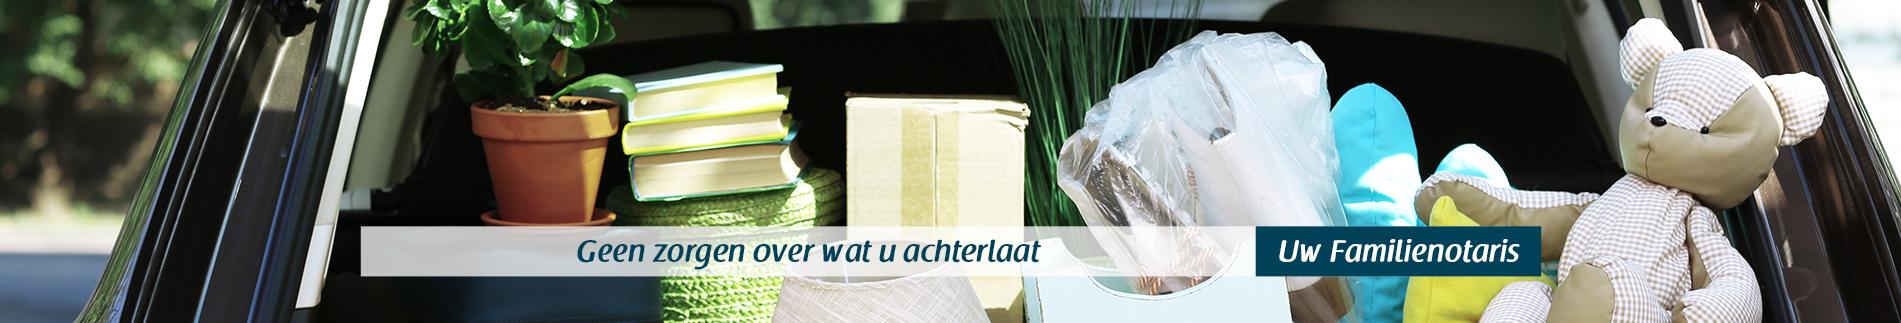 notaris-vriezenveen-nalatenschap-familienotaris